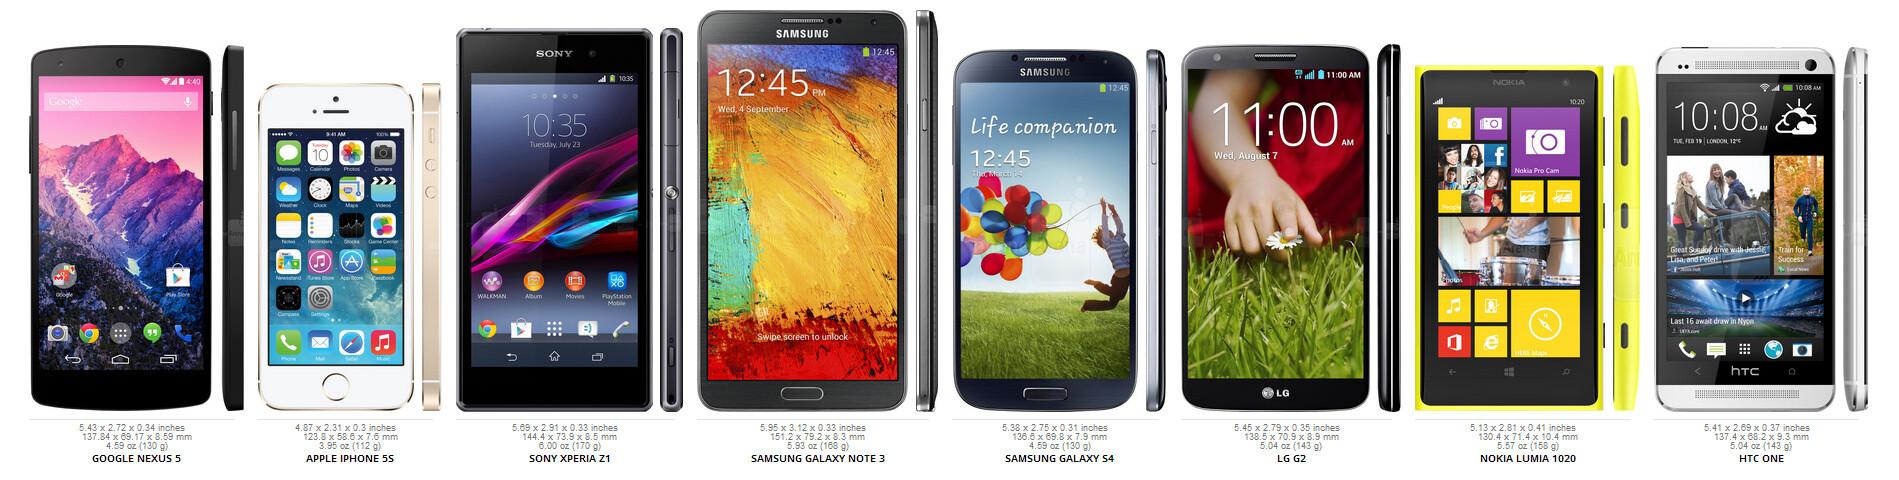 nokia lumia 1020 vs iphone 5s. camera comparison: google nexus 5 vs iphone 5s, sony xperia z1, samsung galaxy nokia lumia 1020 iphone 5s ,